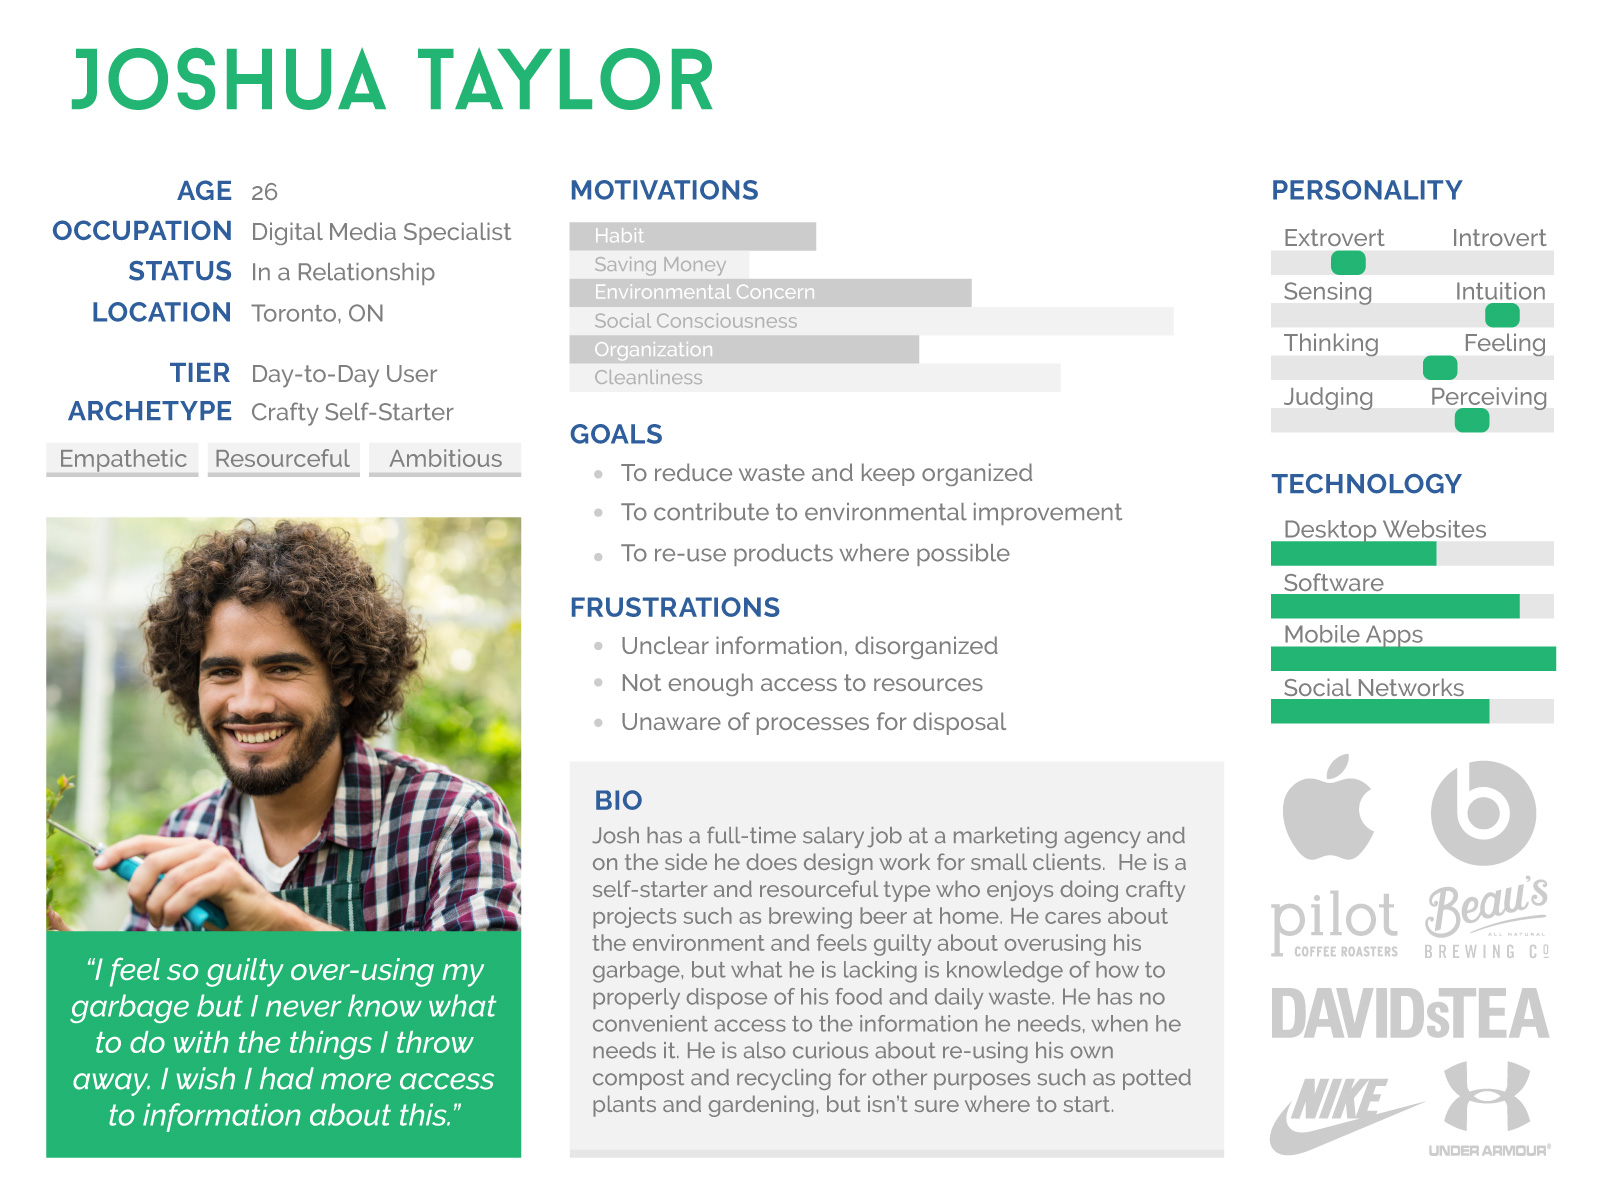 Joshua Taylor Persona